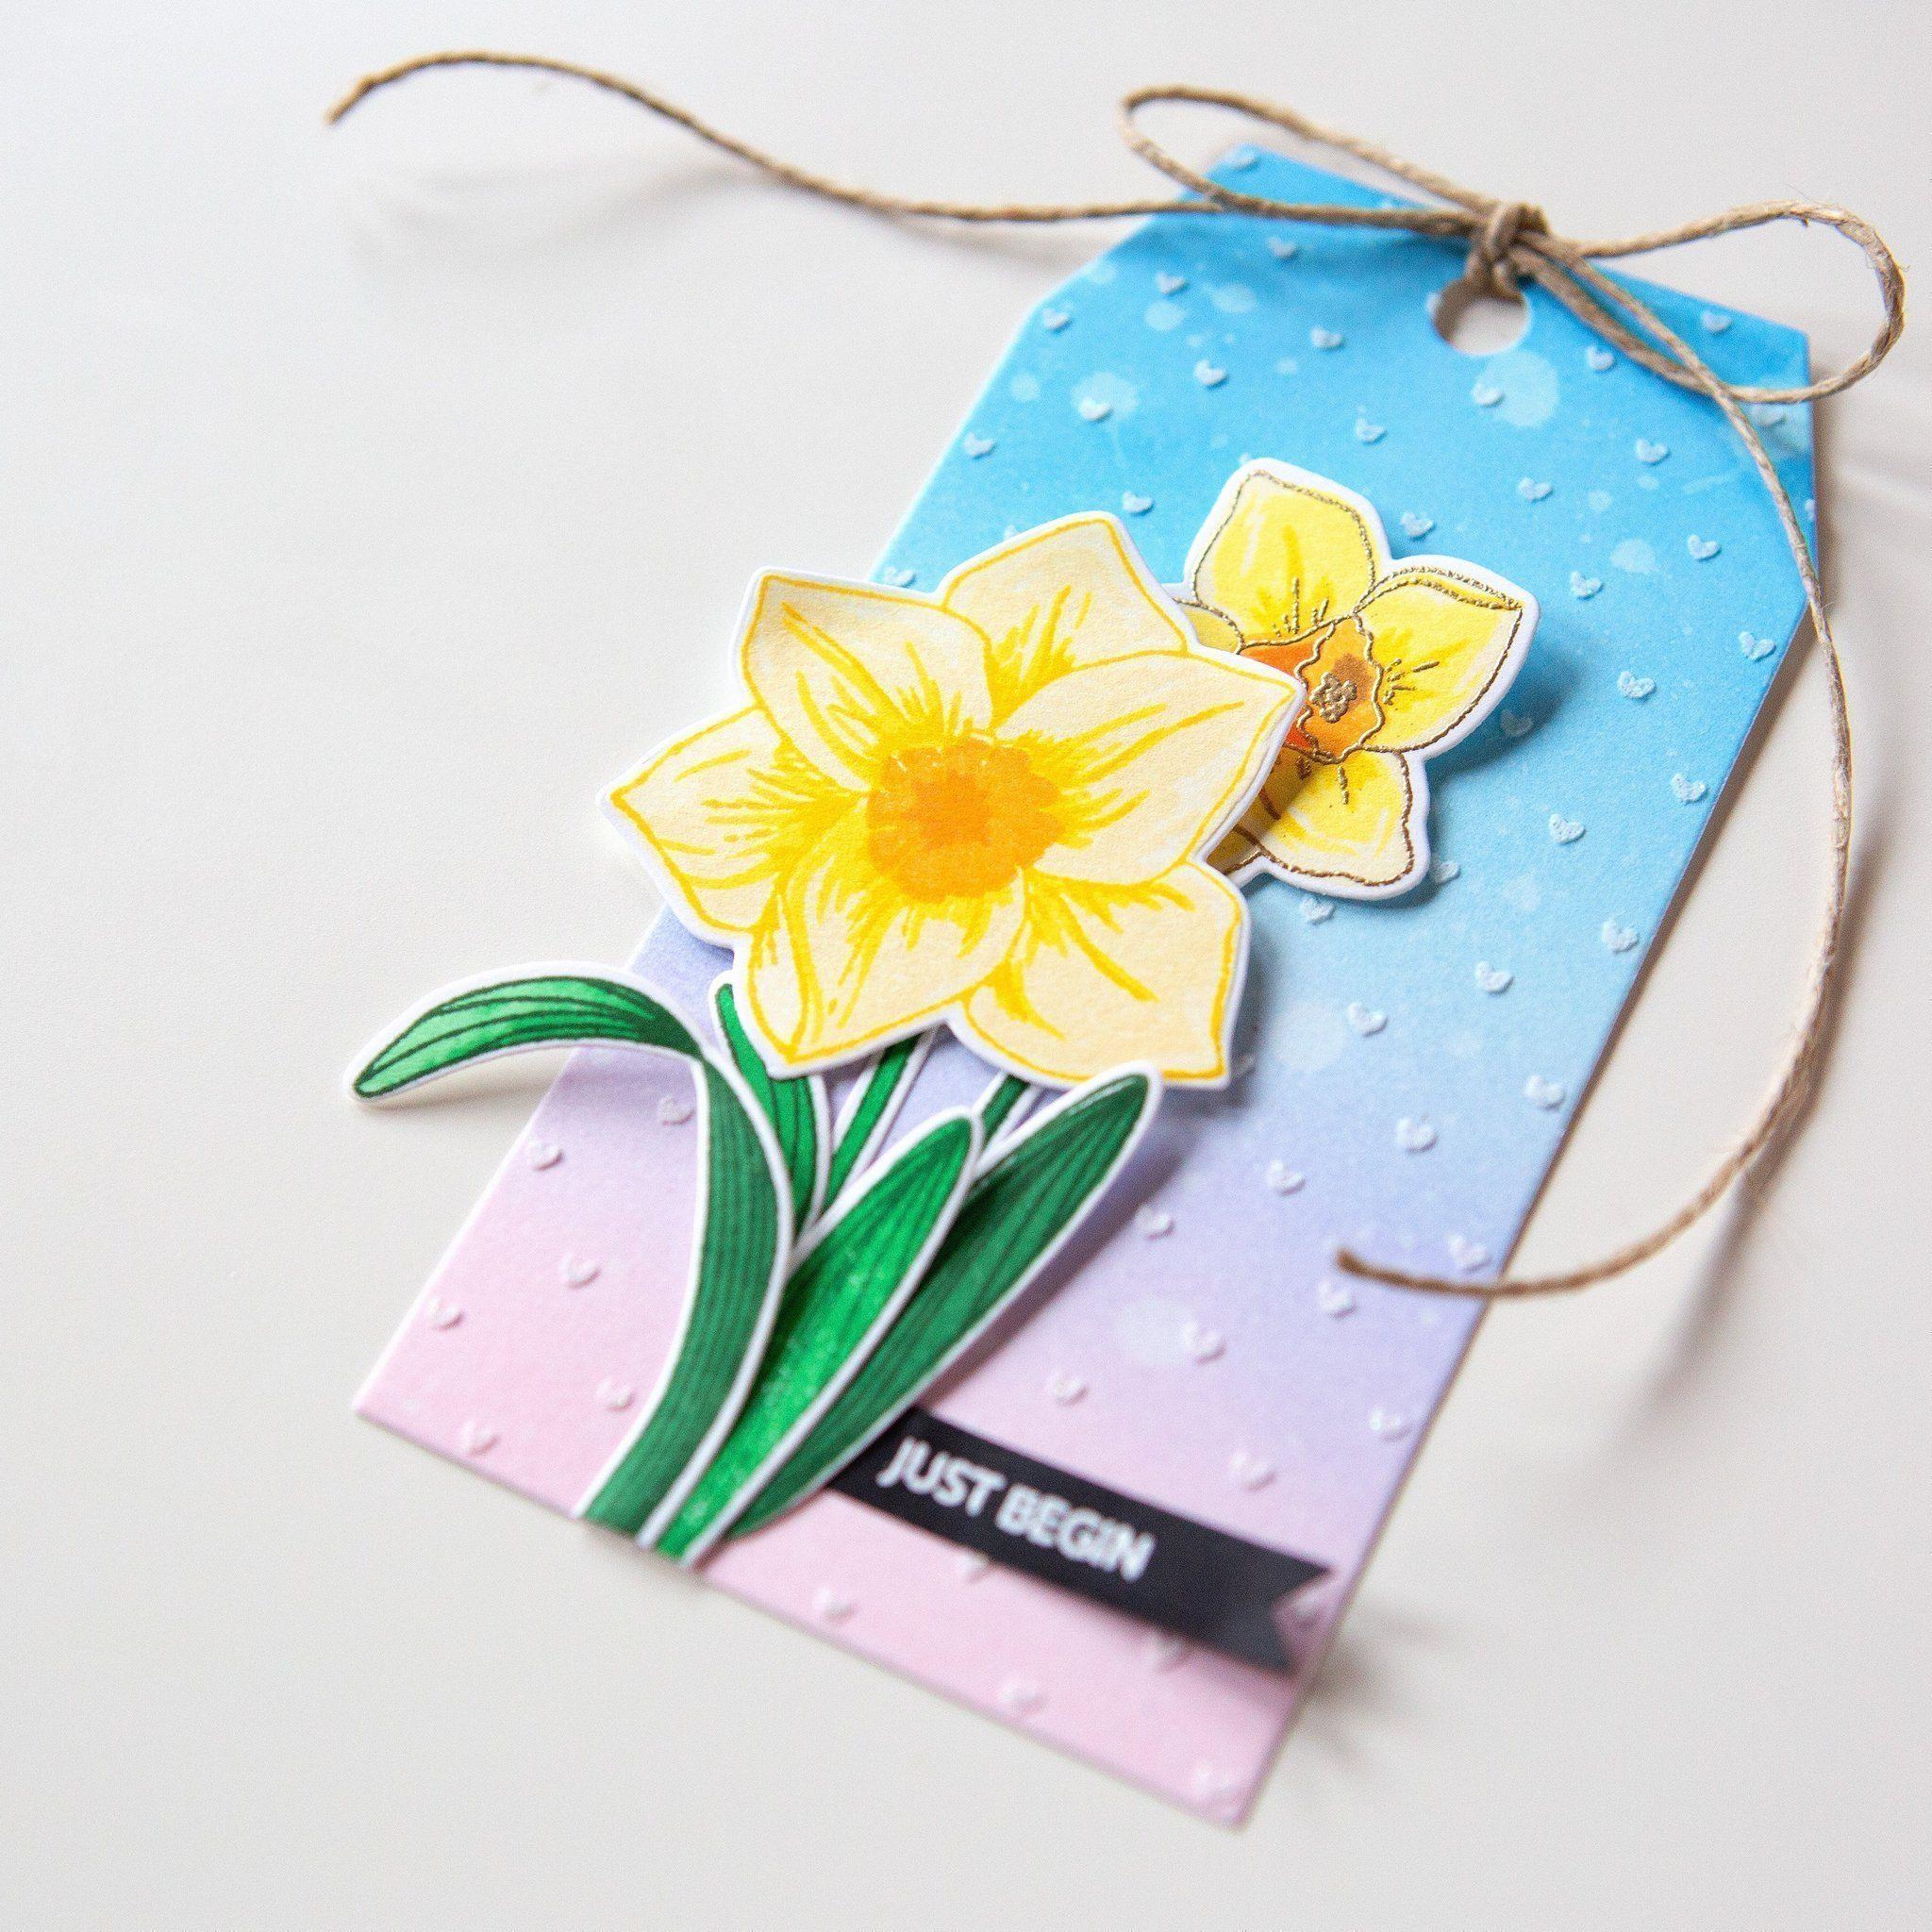 The 20 Year Wedding March: Daffodils, Anniversary Flowers